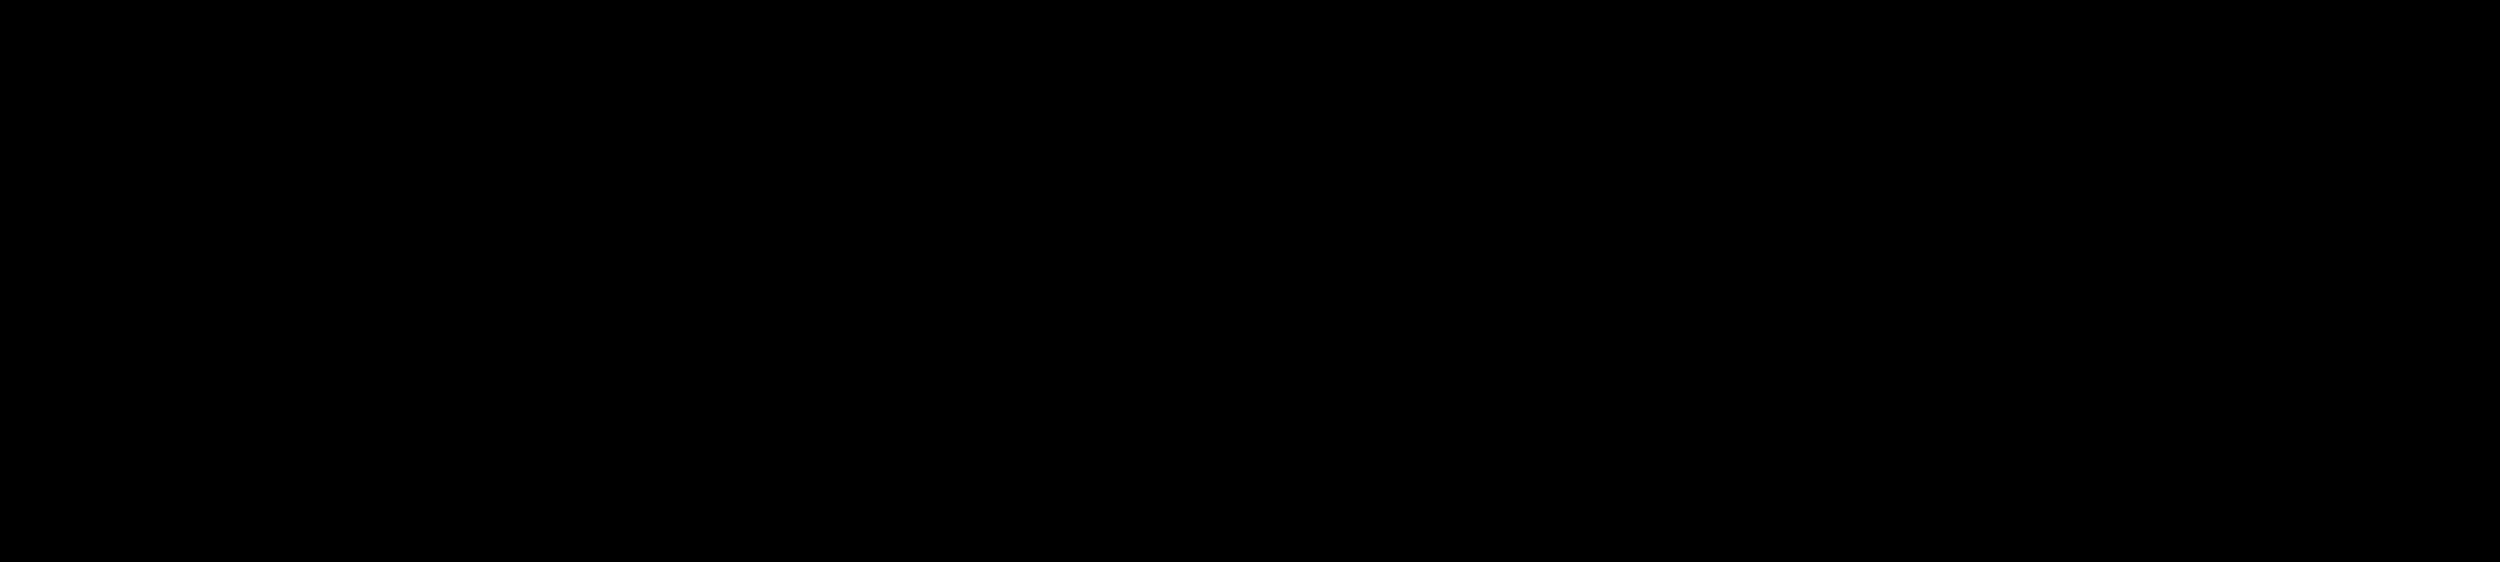 Comfort_Colors_logo.png